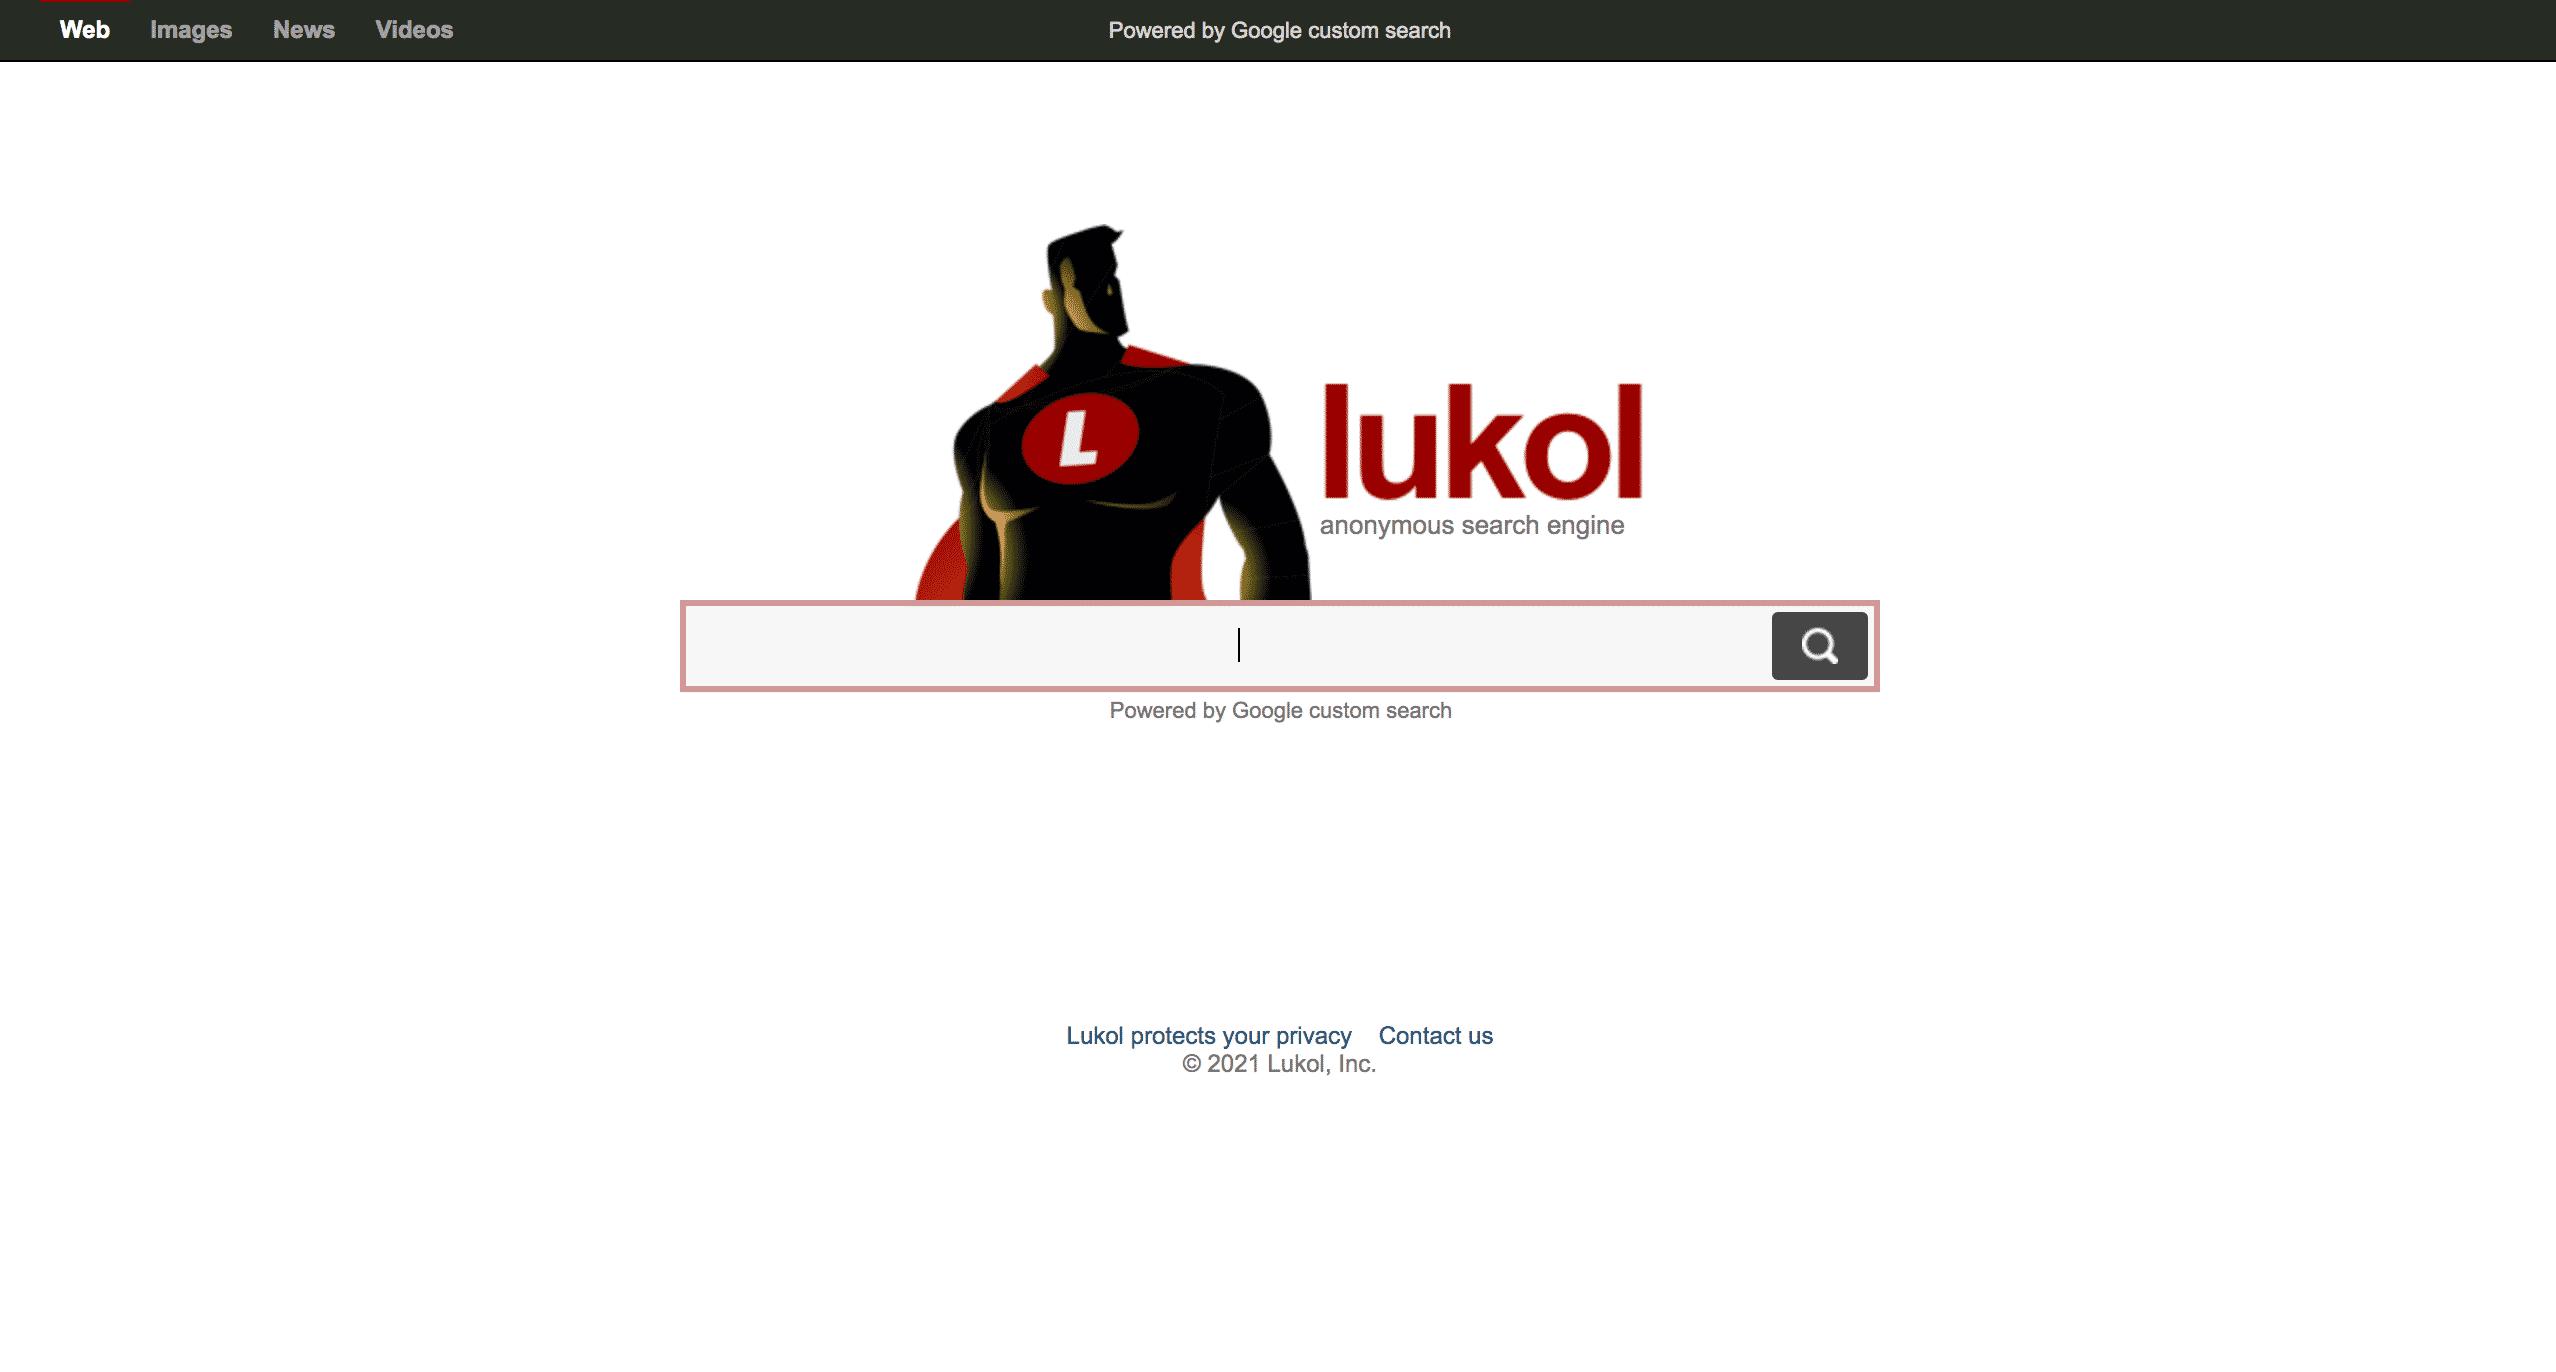 Lukol moteur de recherche anonyme